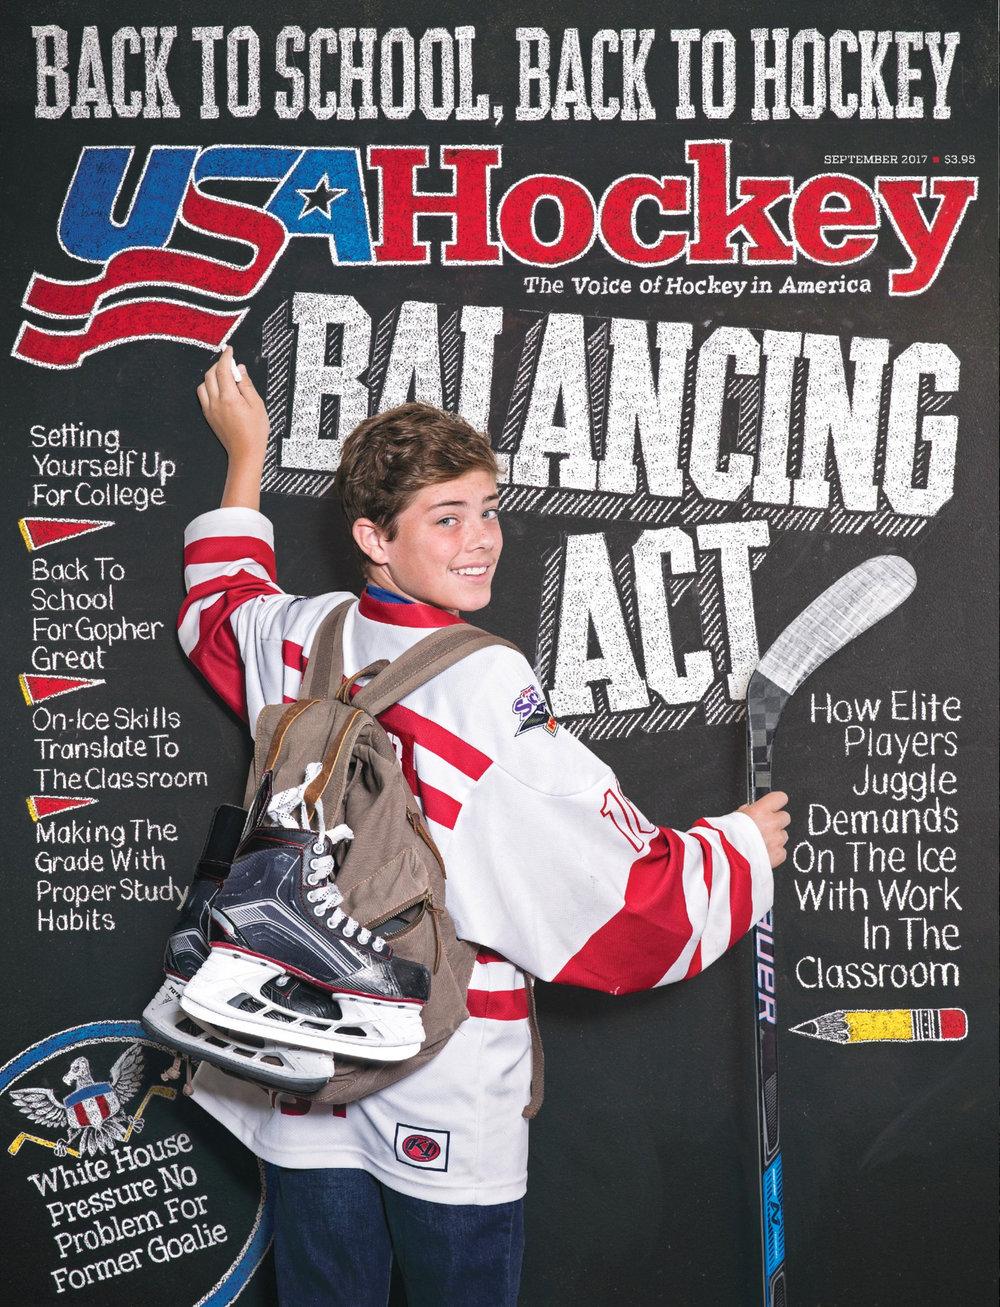 USAHockeySept2017-01.jpg